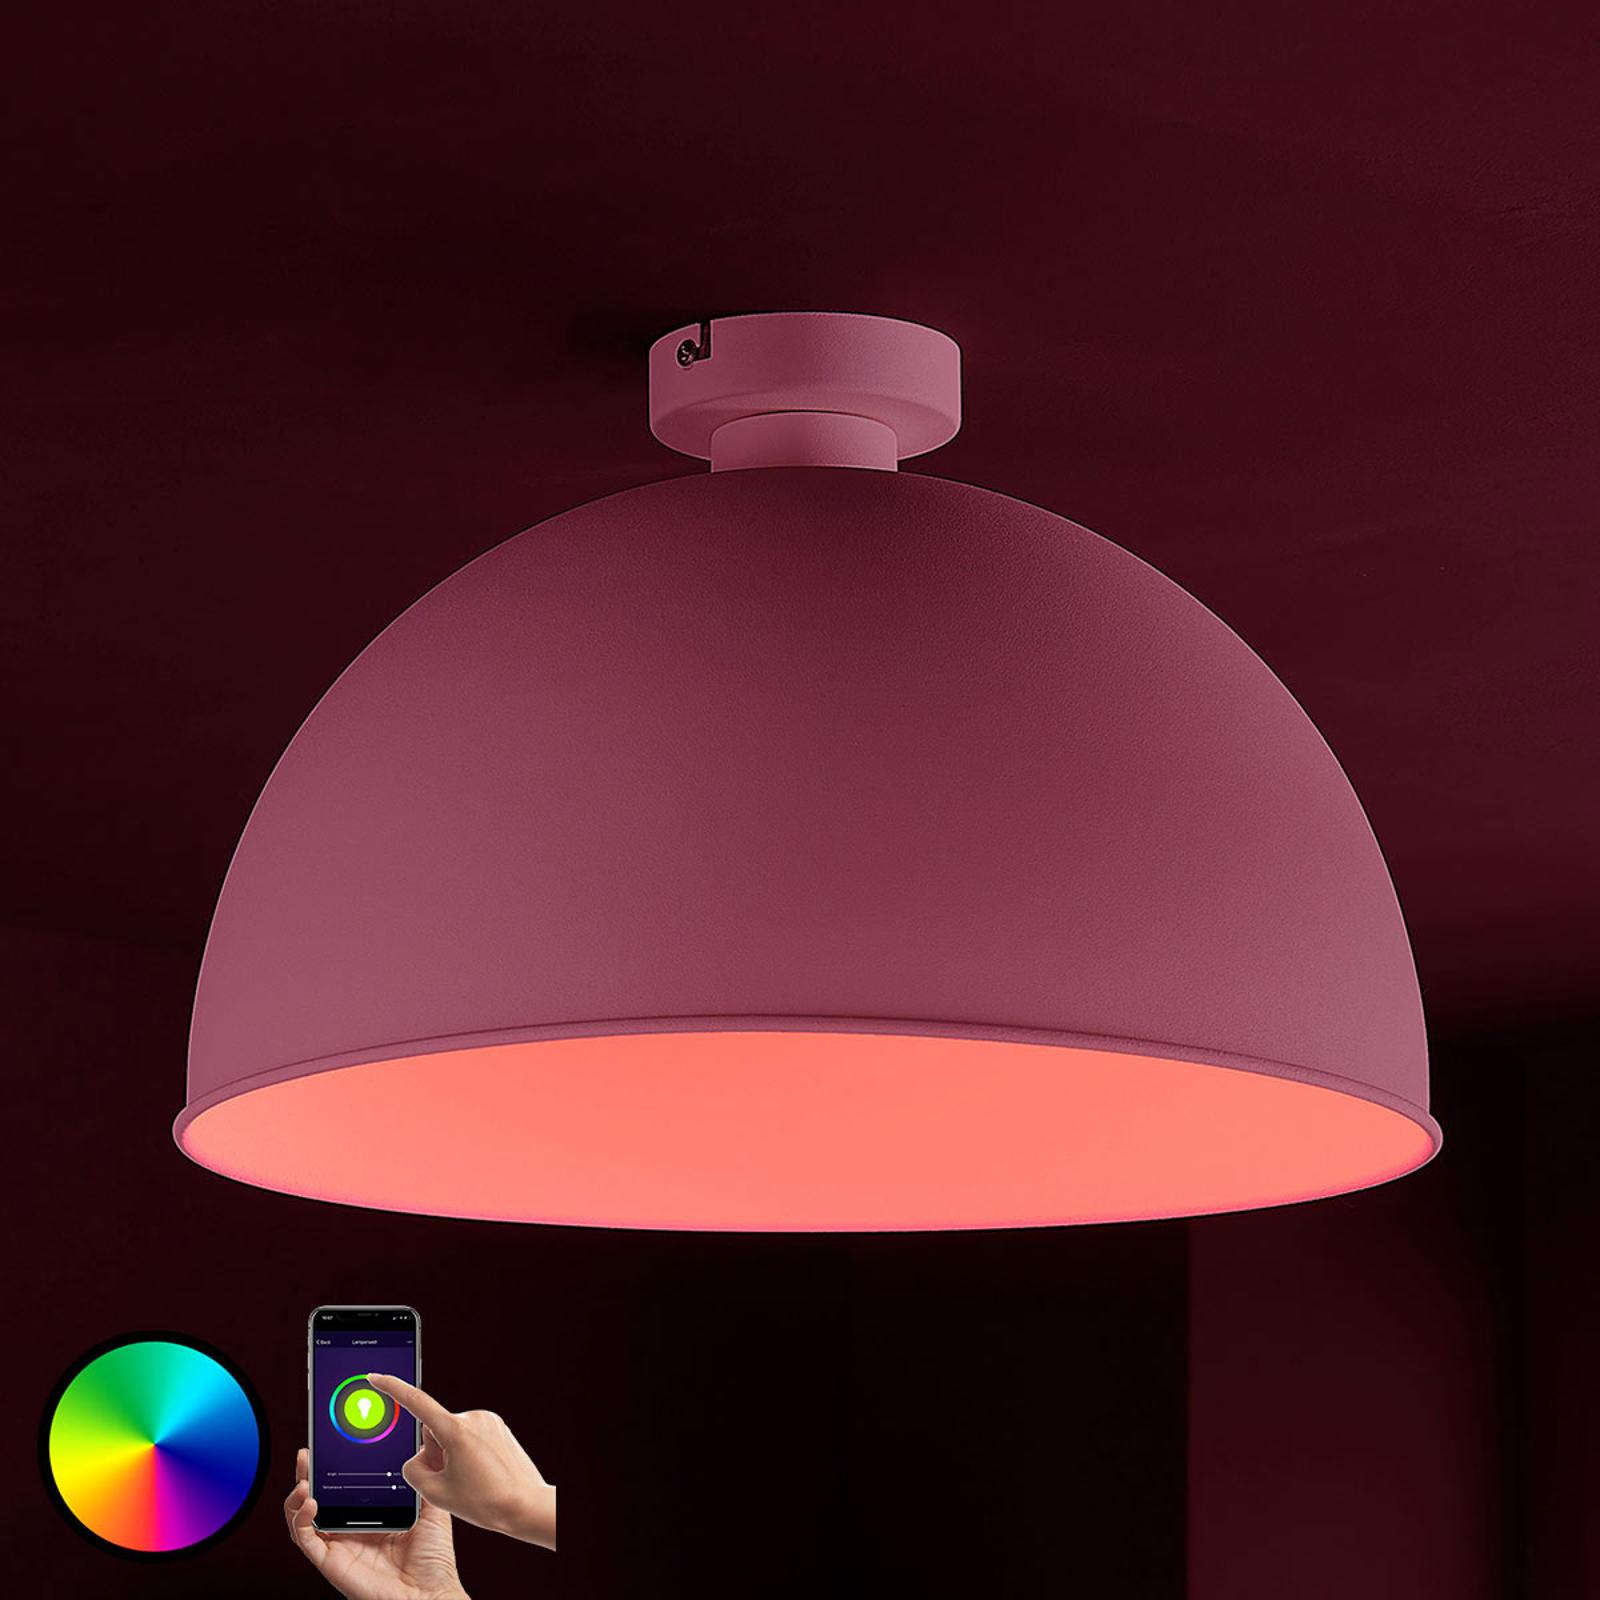 Lampa sufitowa LED Bowl WiFi 41cm biała